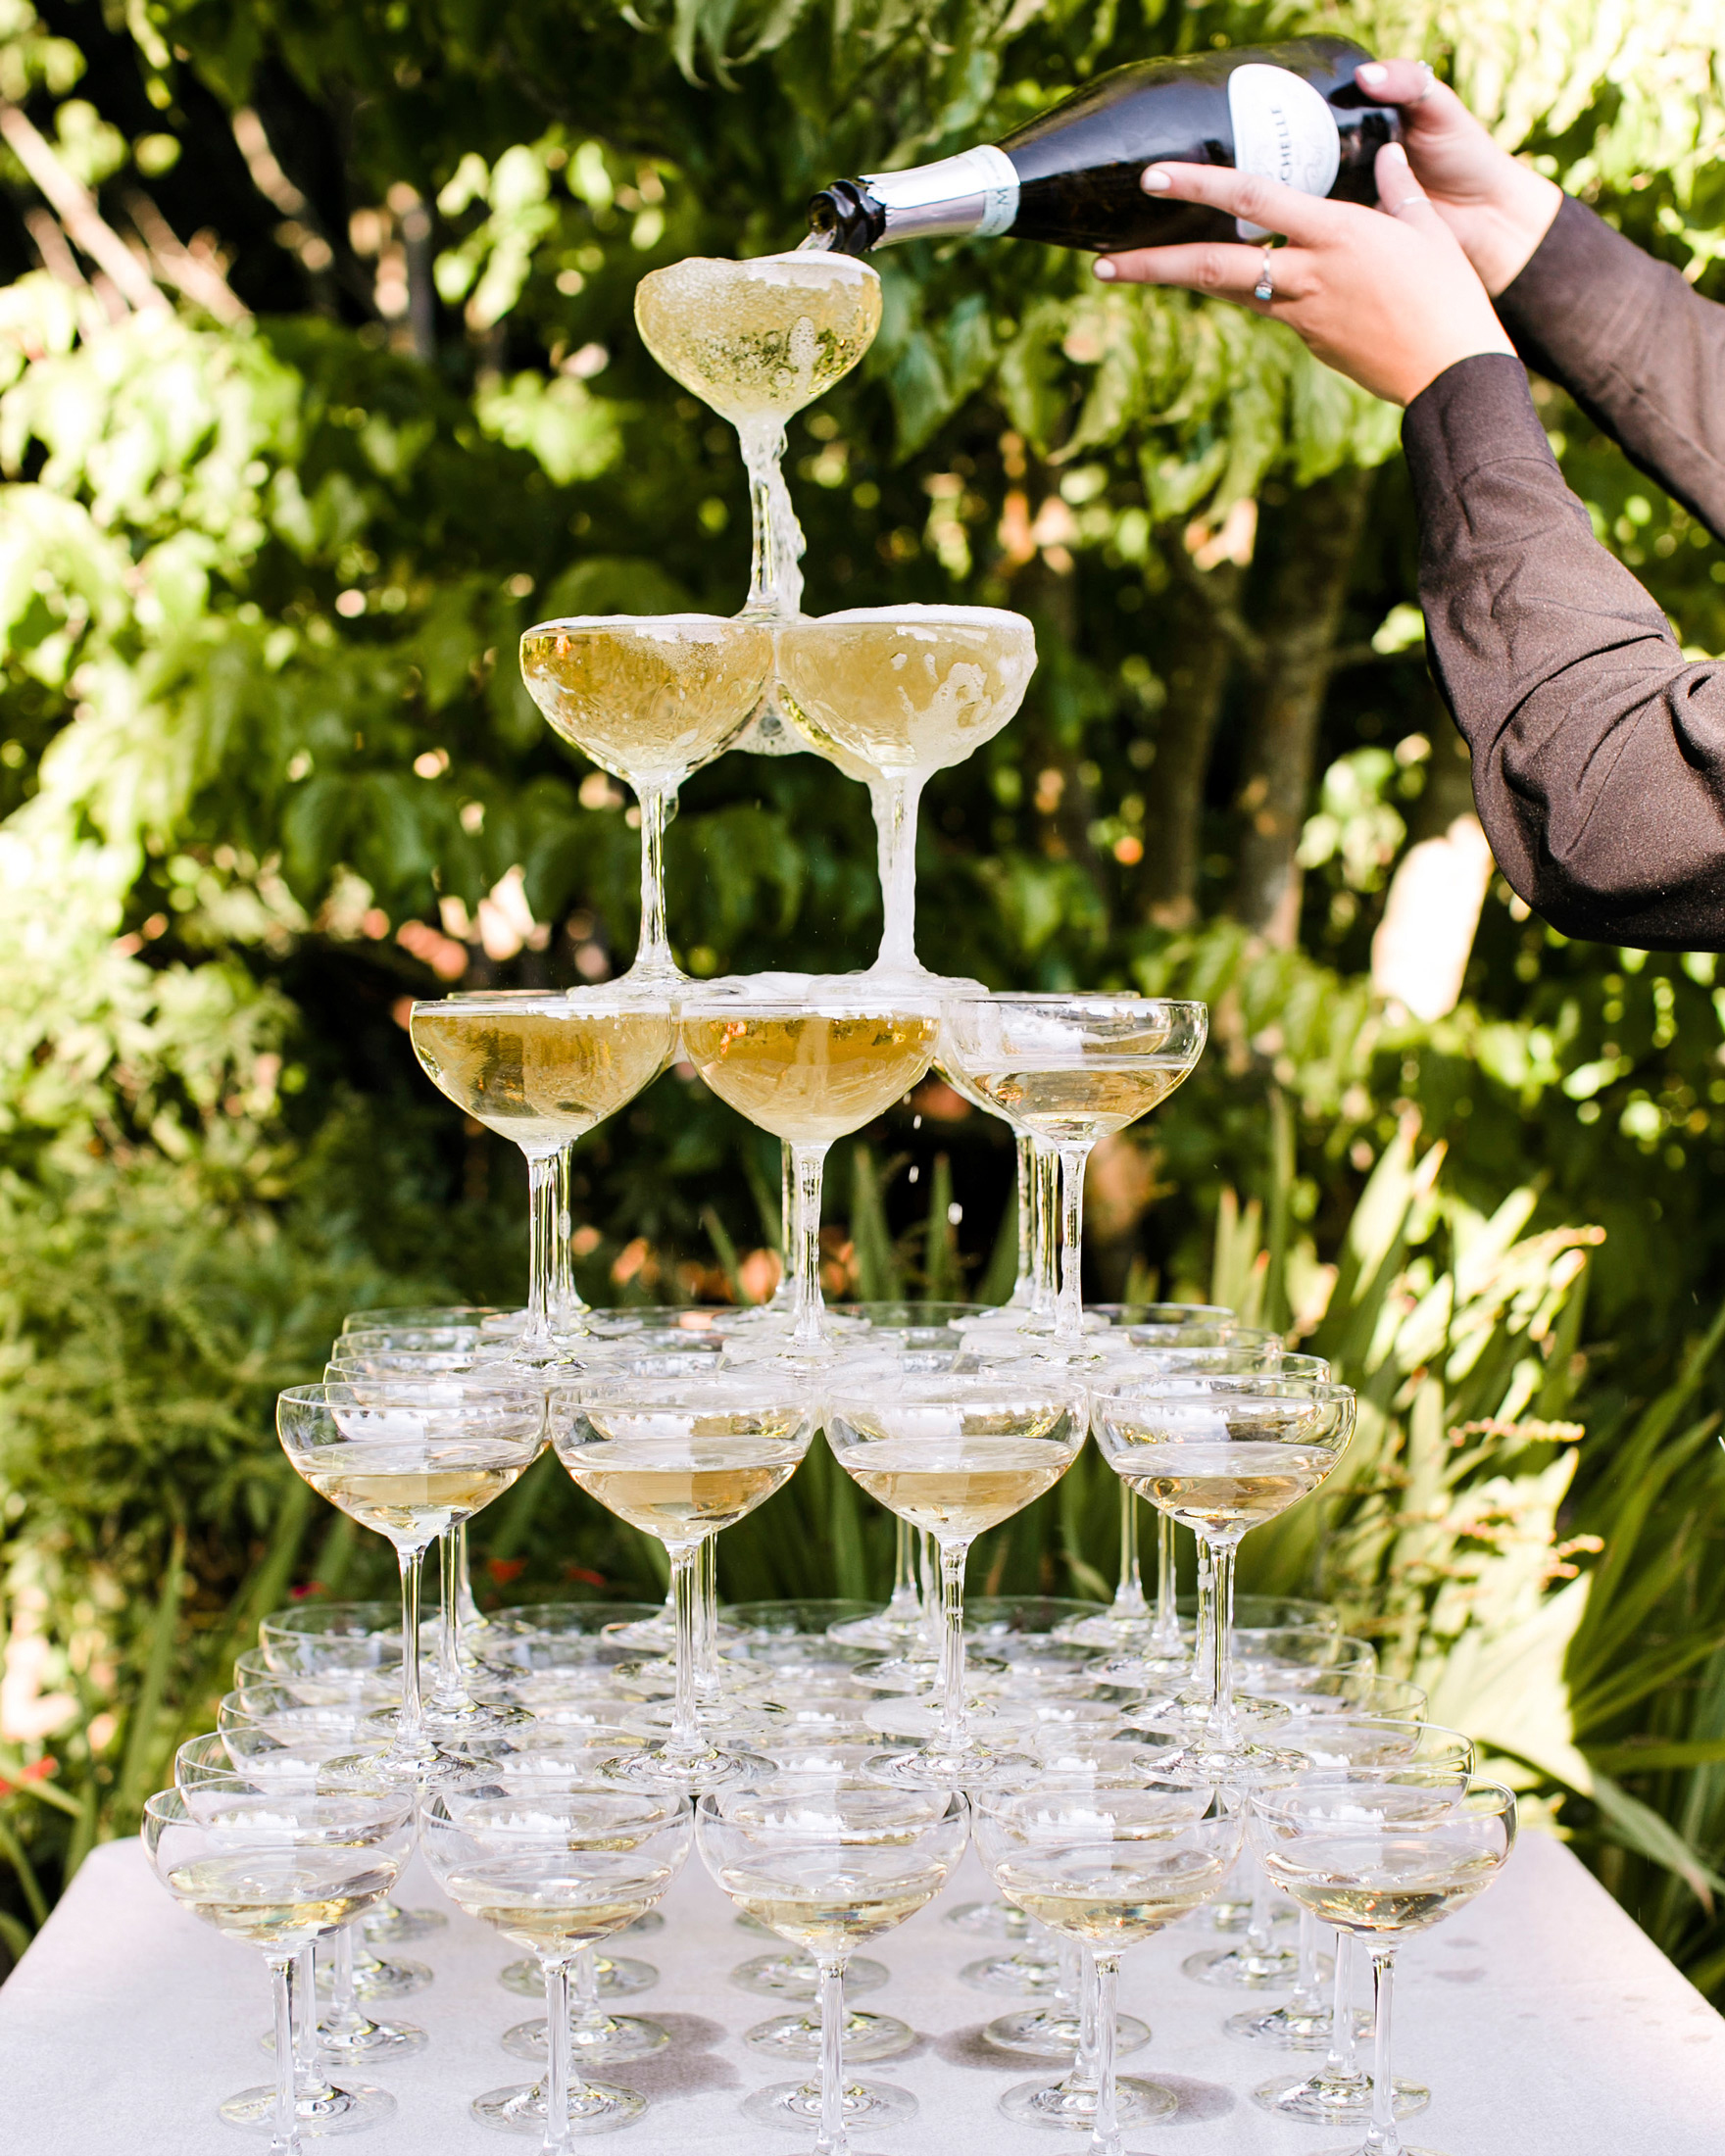 wedding-weekend-ideas-champagne-tower-0416.jpg